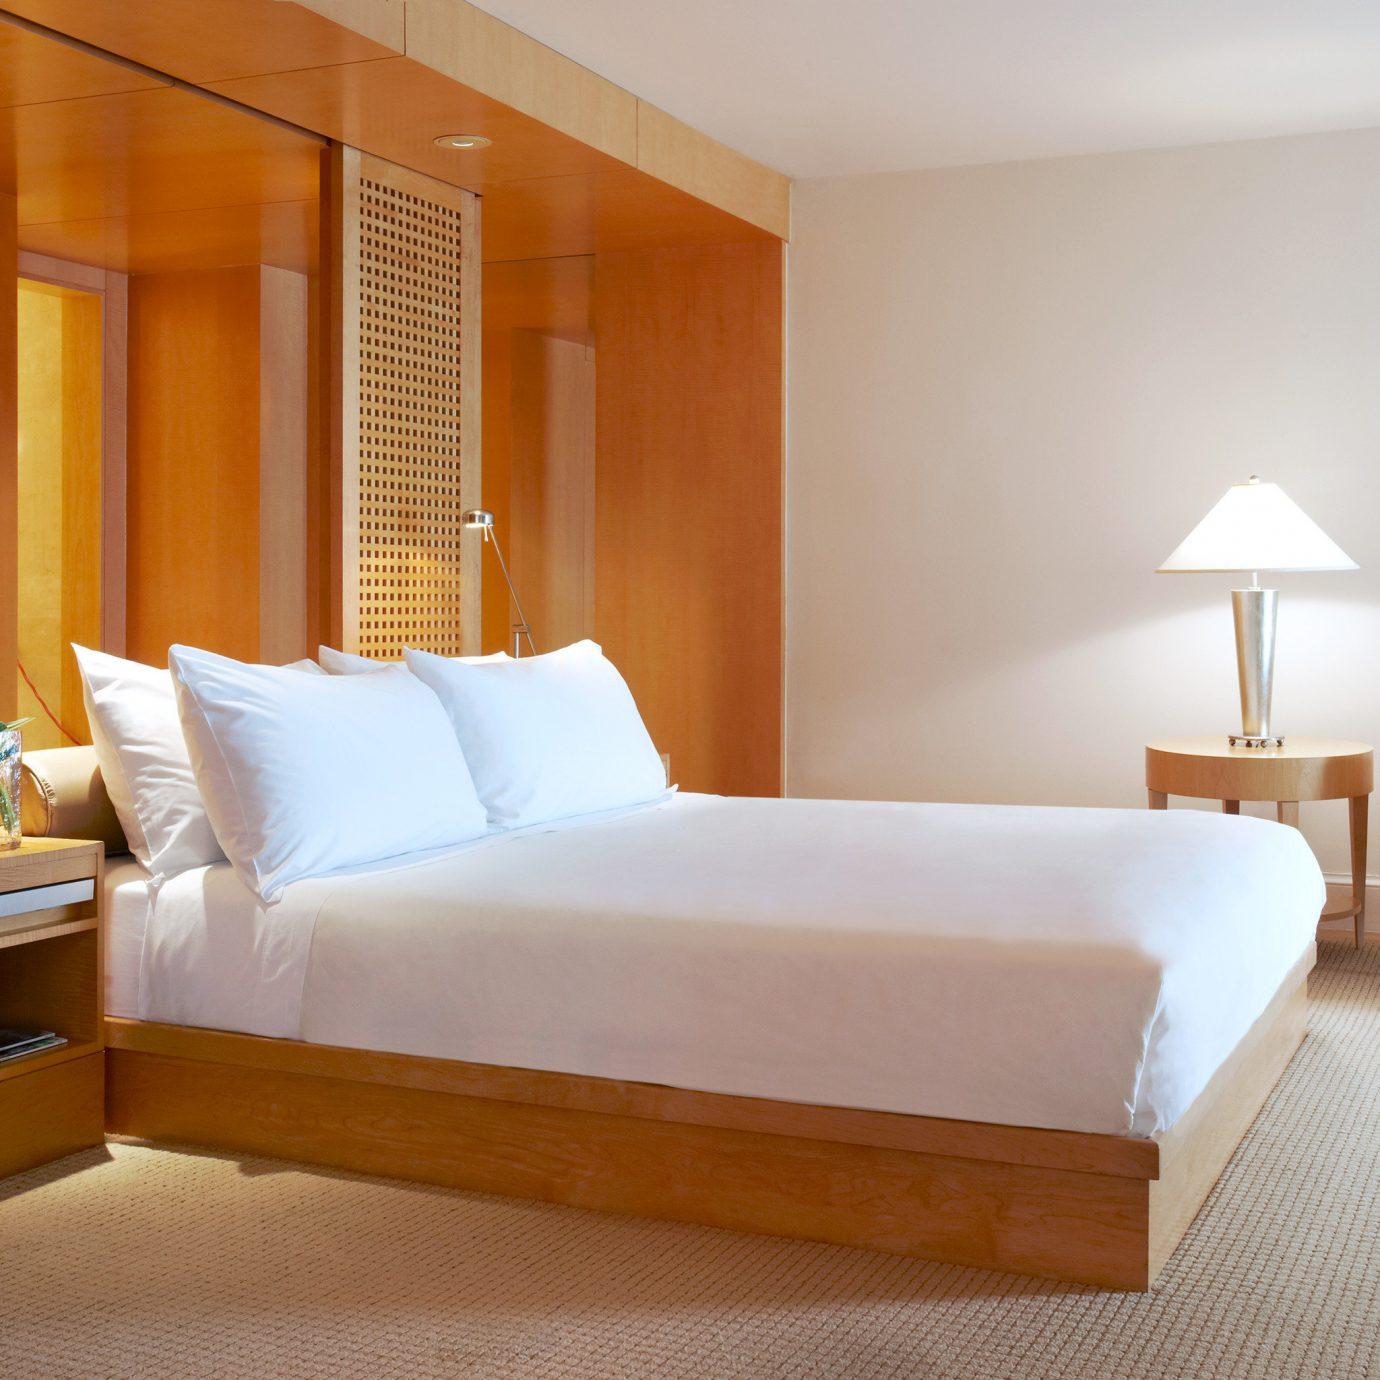 property Bedroom Suite condominium bed frame living room cottage